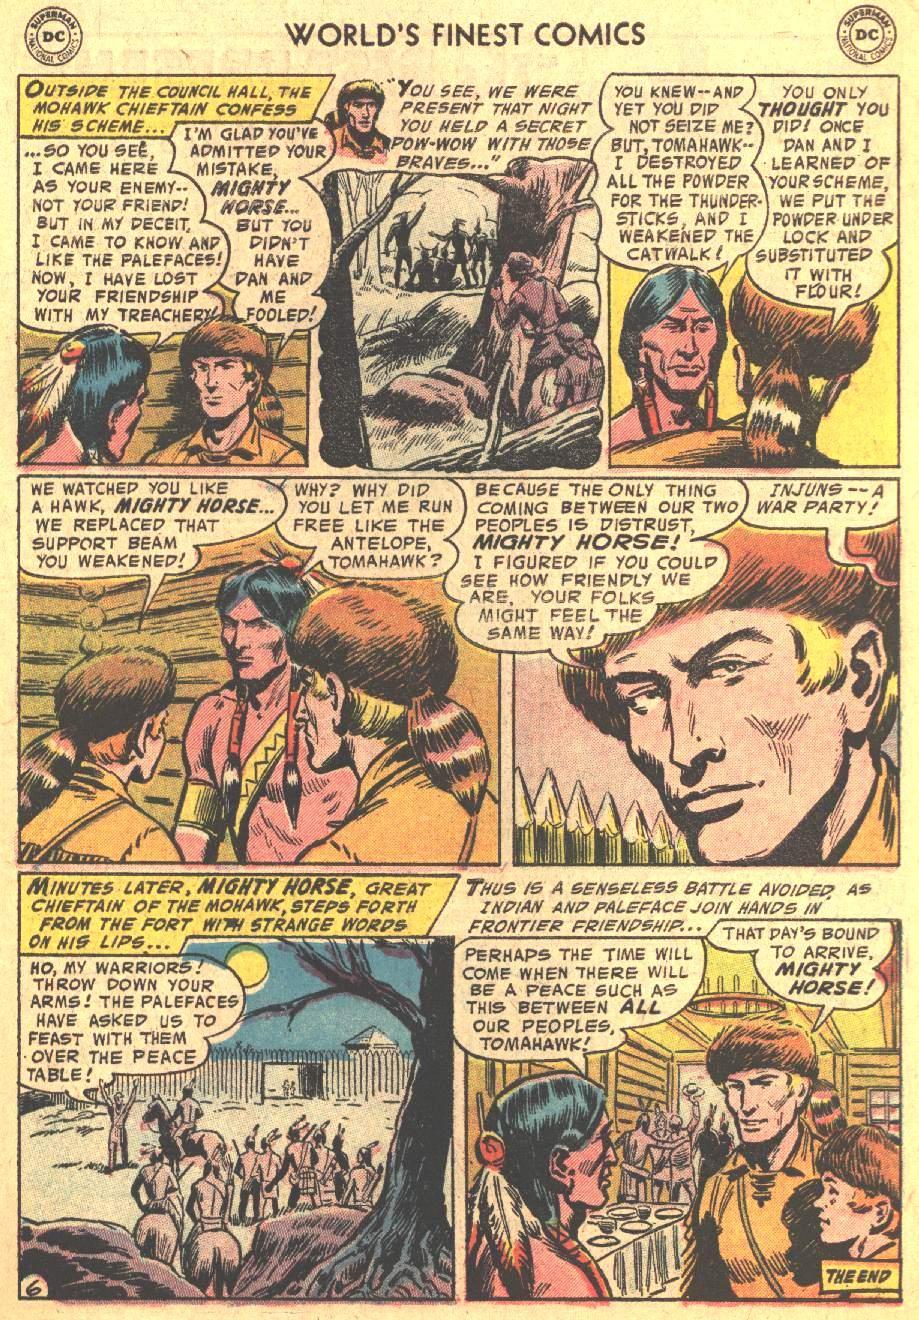 Read online World's Finest Comics comic -  Issue #80 - 33